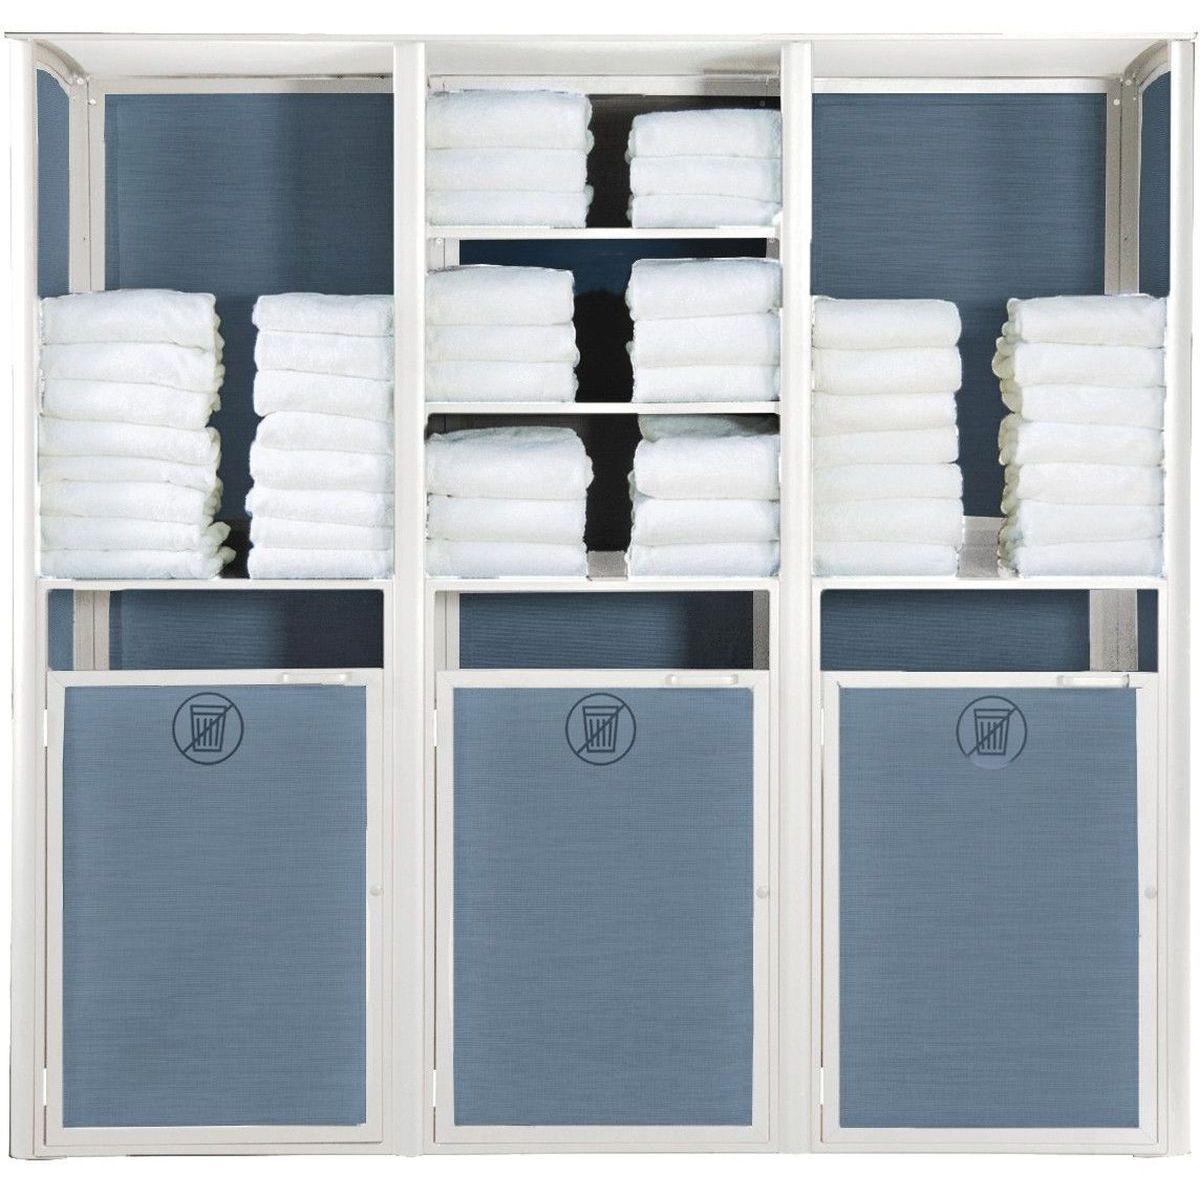 Grosfillex Sunset Towel Valet Triple Unit in Blue/Glacier White